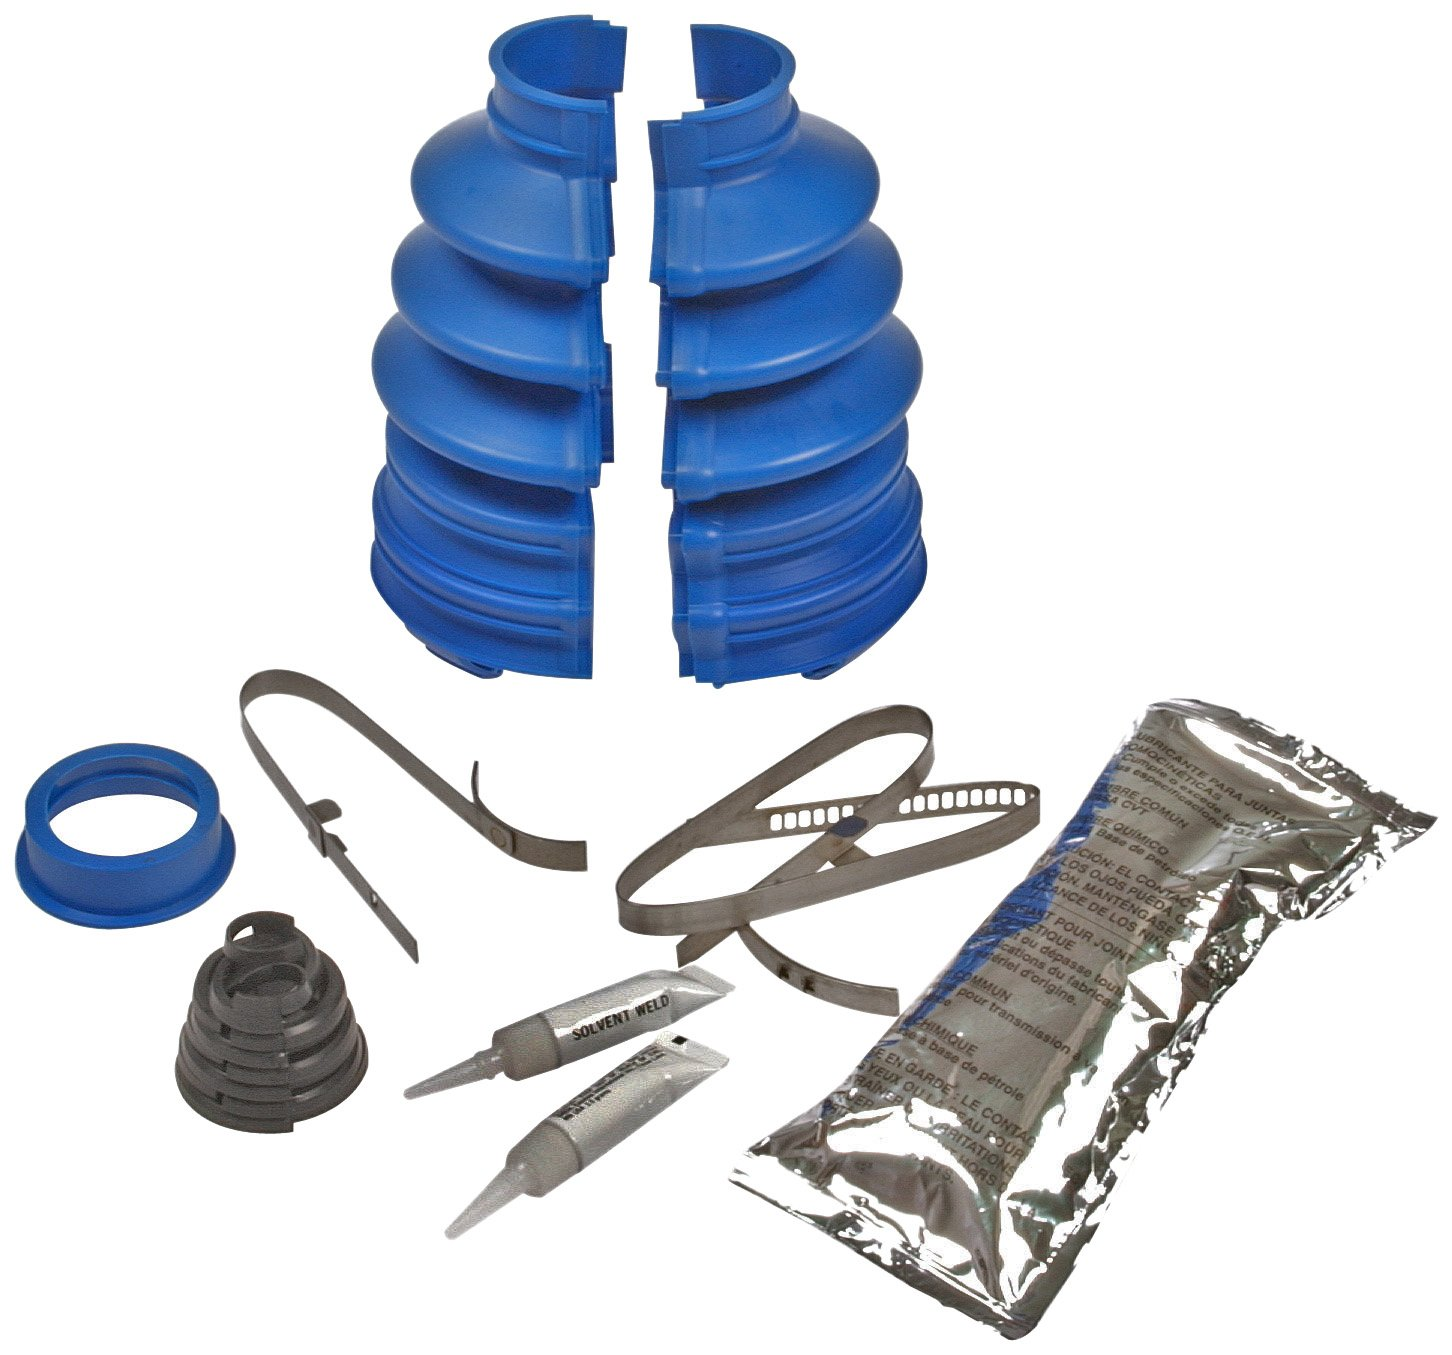 Dorman HELP! 614-632 C Series Universal Quick Boot Kit